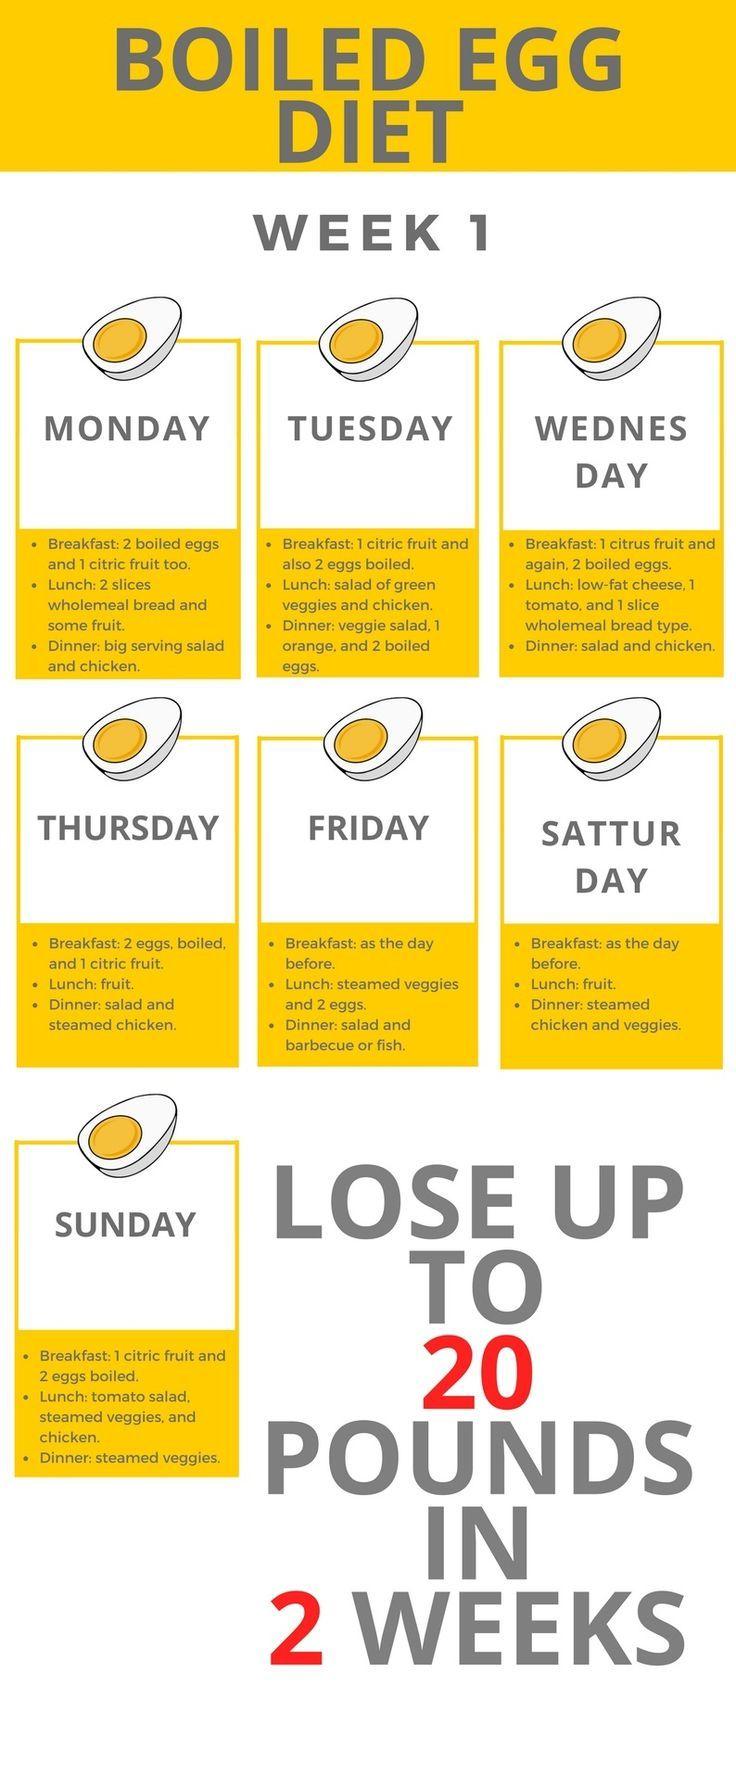 Dr. phil weight loss menu plan